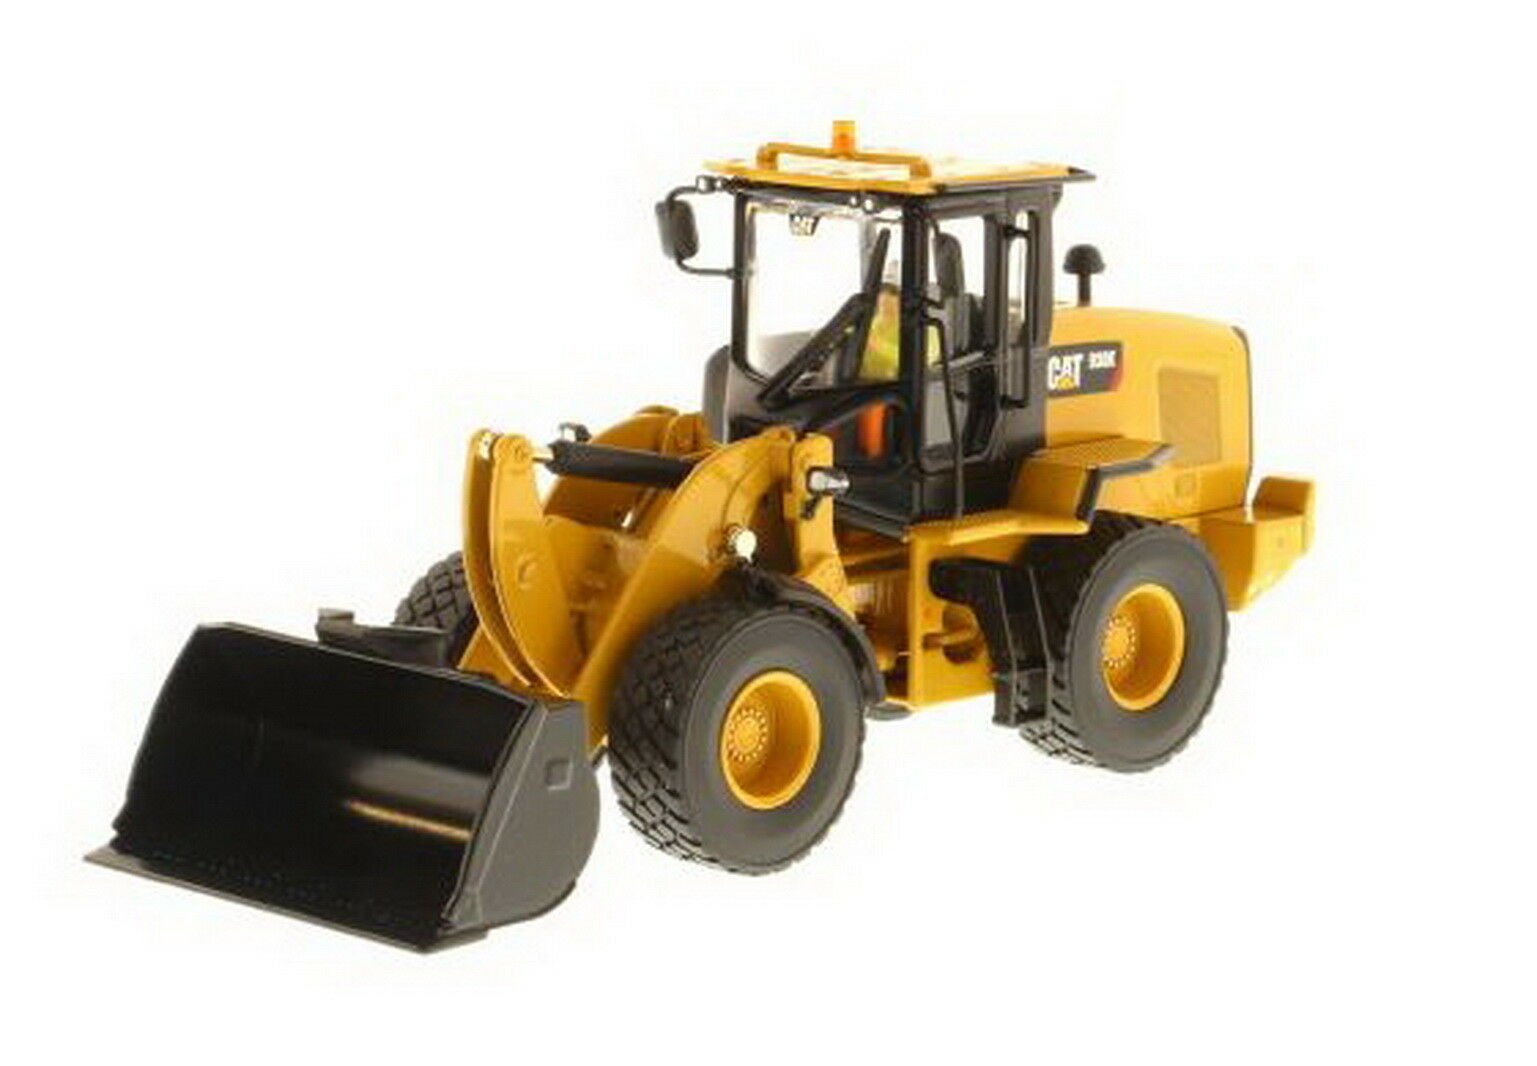 1 50 DM Caterpillar Cat 930K Wheel Loader Diecast Model  85266  | Exquisite Handwerkskunst